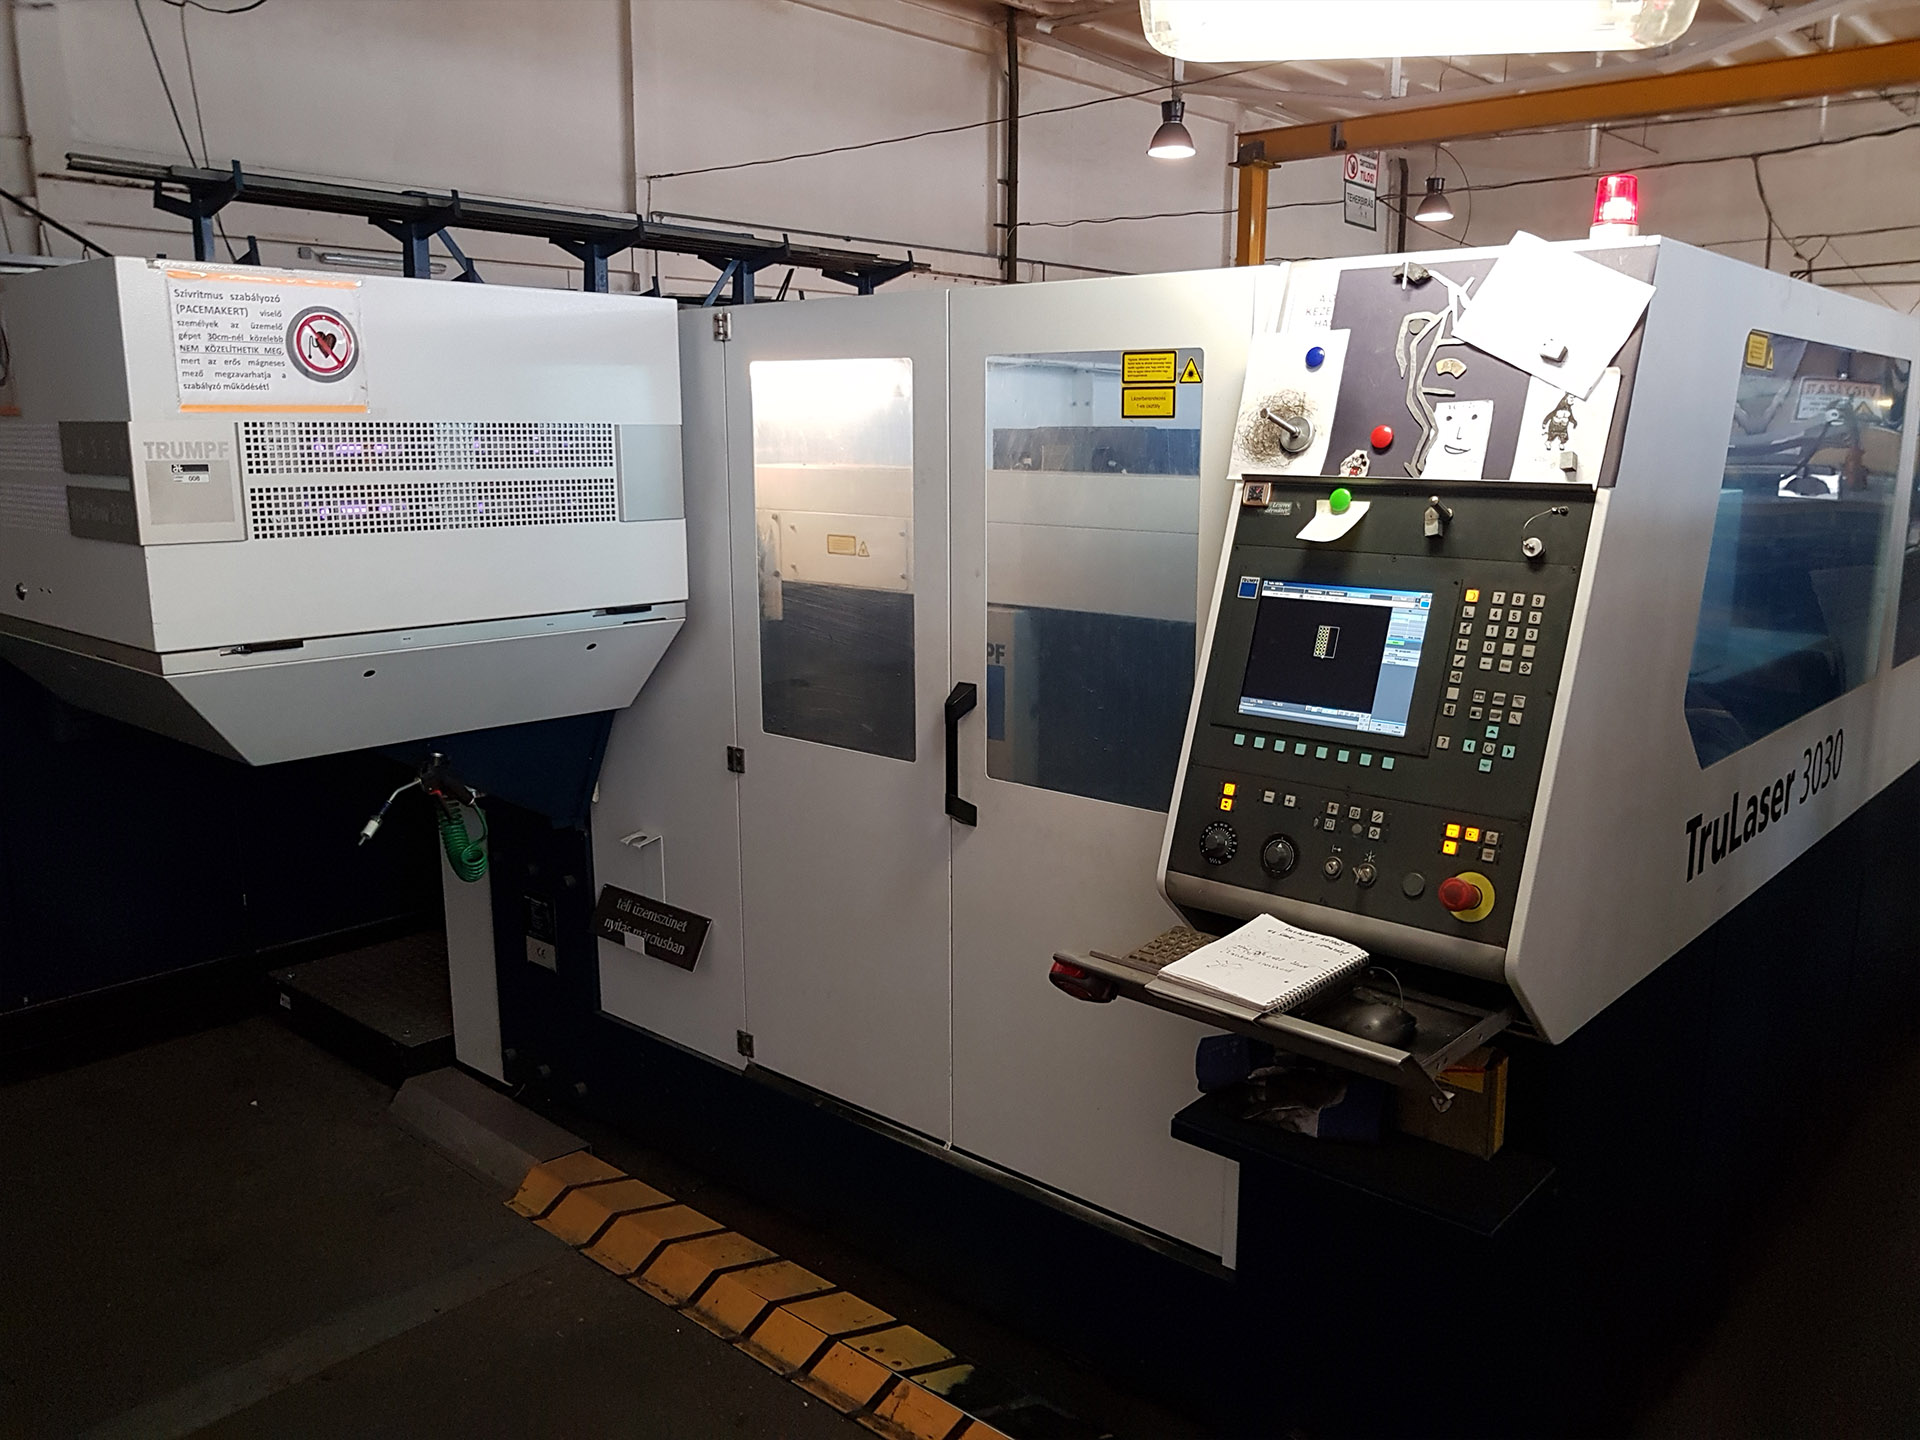 Price of Trumpf laser cutting machine